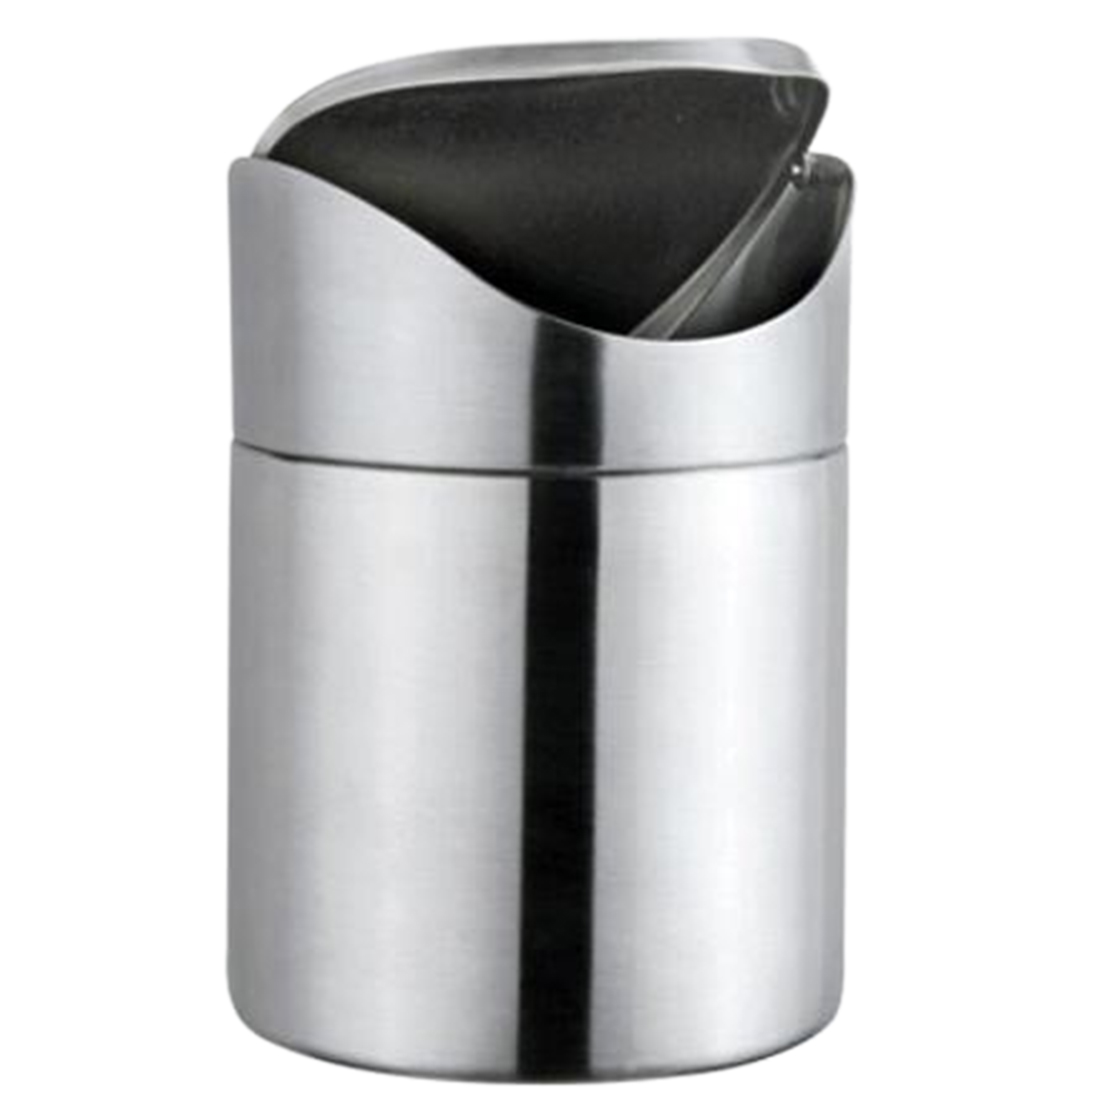 Hipsteen Stainless Steel Mini Desktop Trash Can With Swing Lid Storage  Barrels Rubbish Bin Kitchen Office